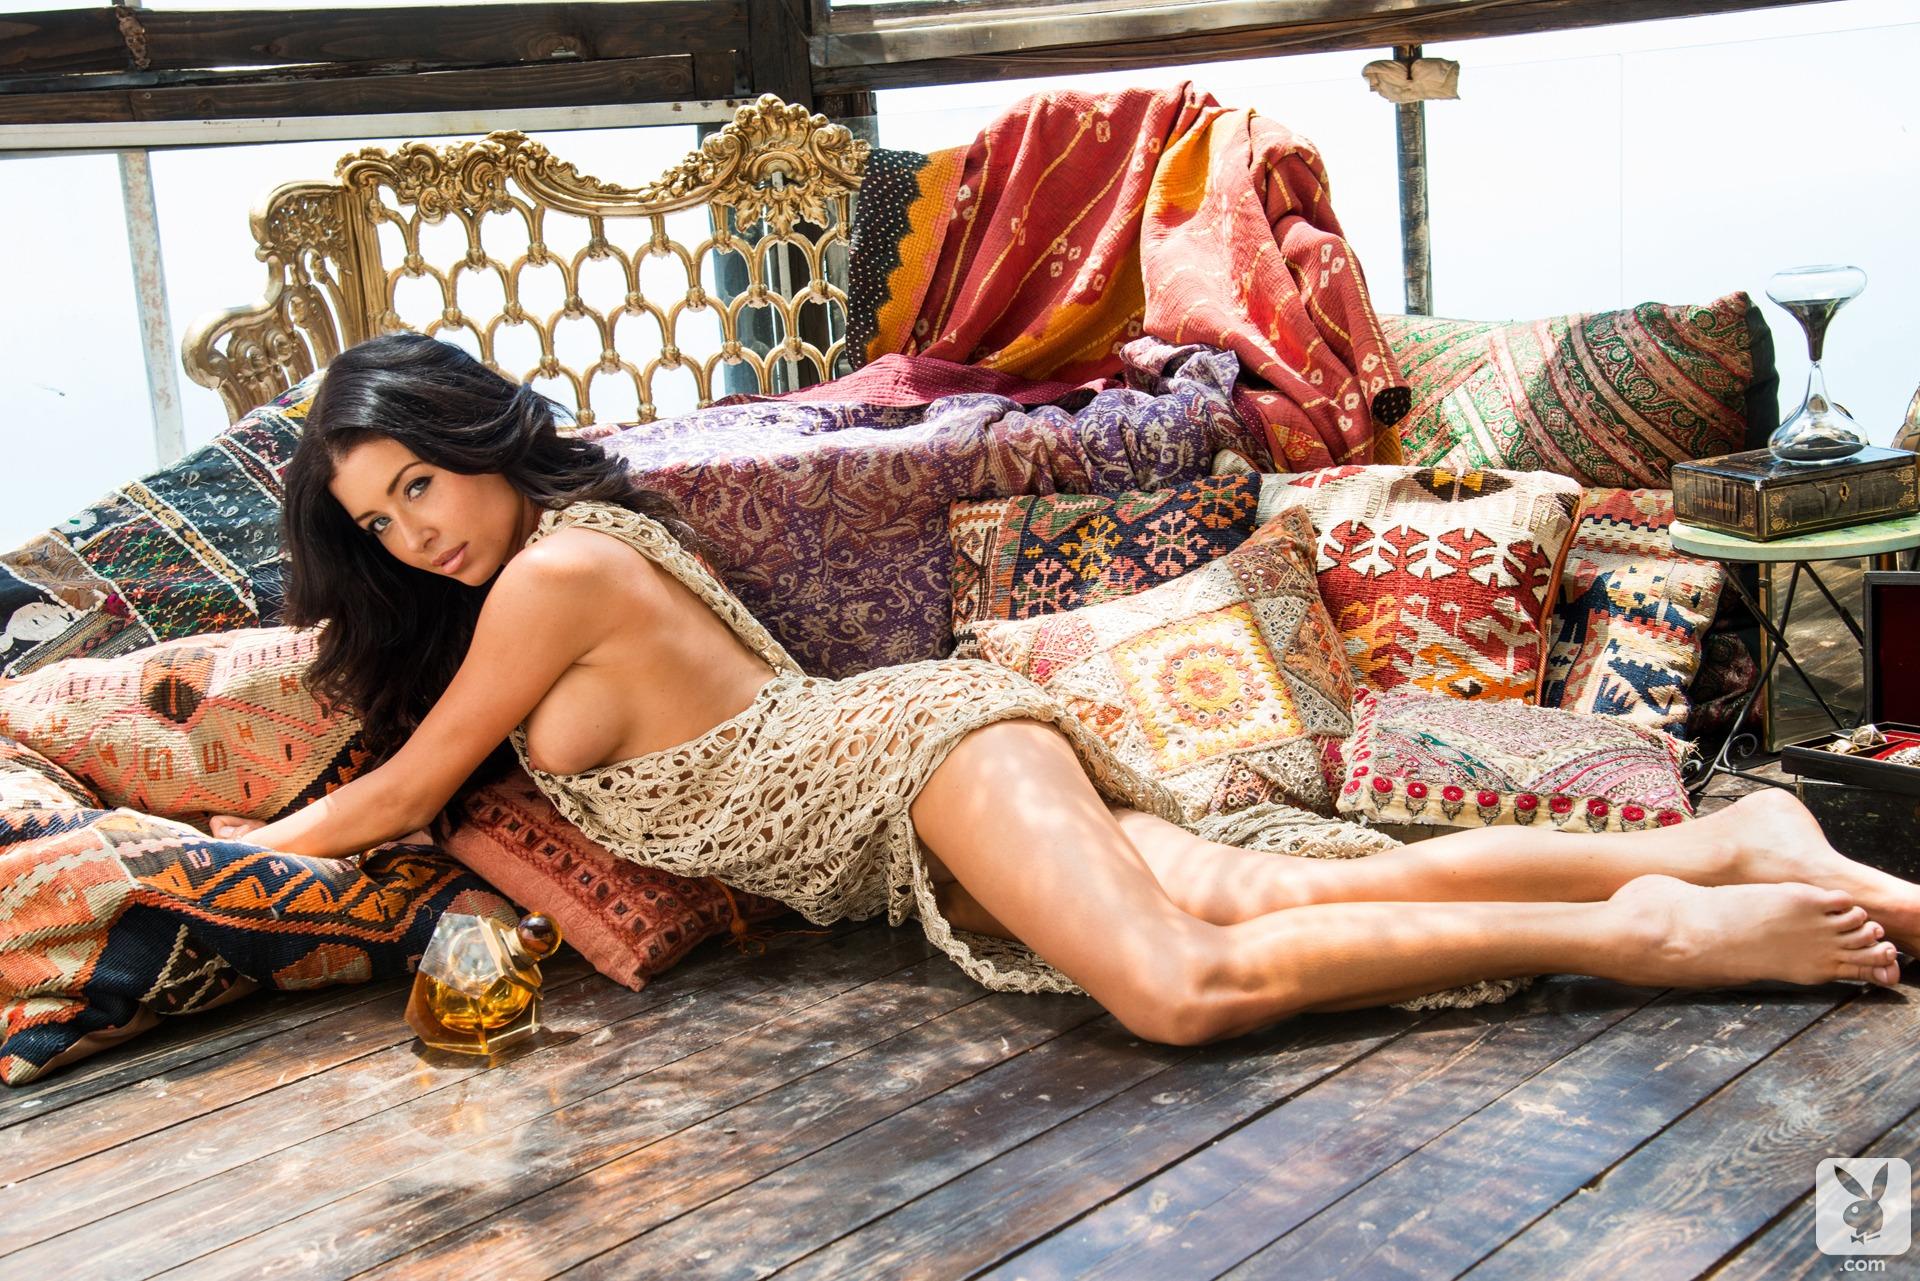 Gemma Lee Farrell Nude Cool gemma lee farrell nude playboy 07 redbust